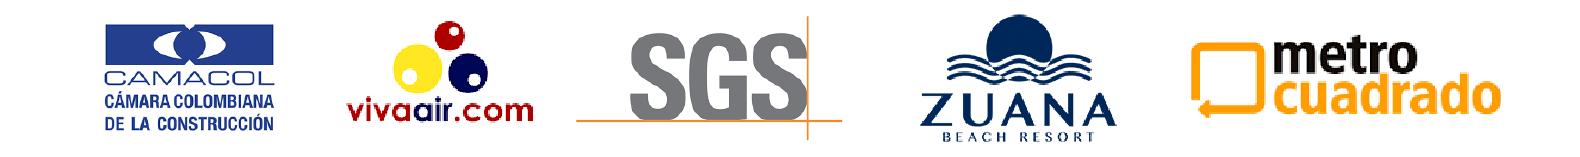 Logos Impulsa_Mesa de trabajo 1